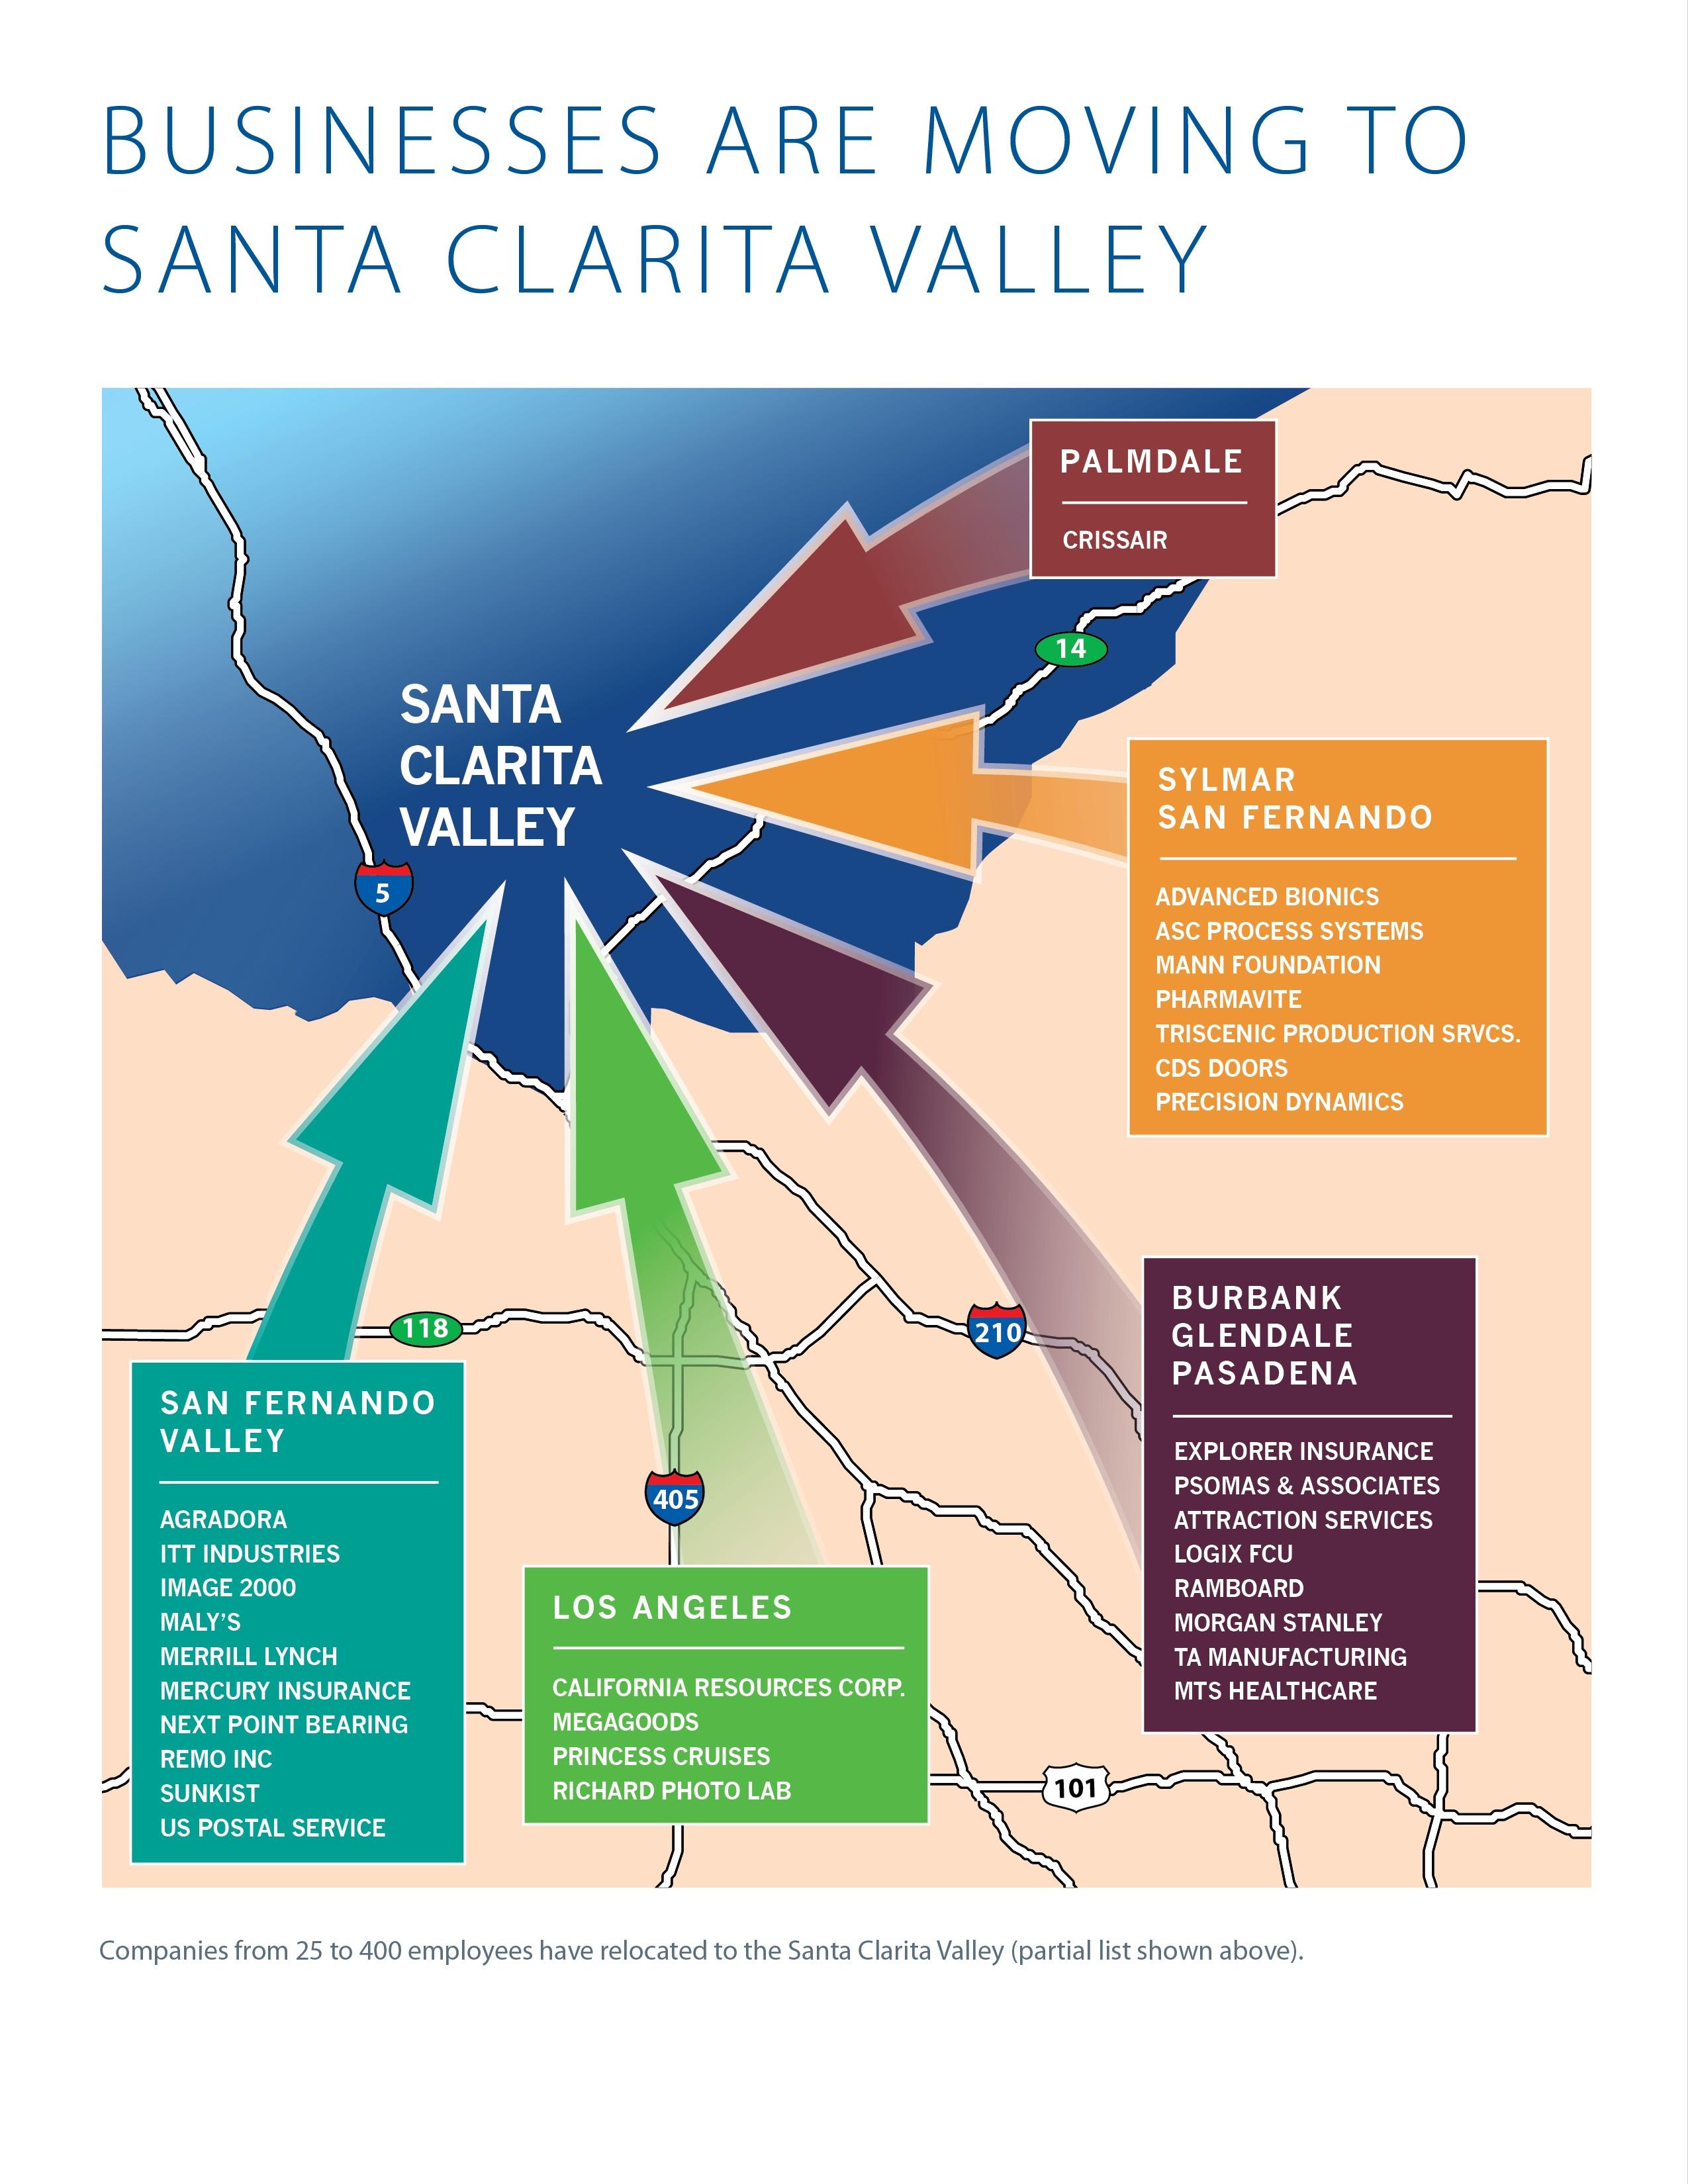 Santa Clarita Valley Great Location for Business